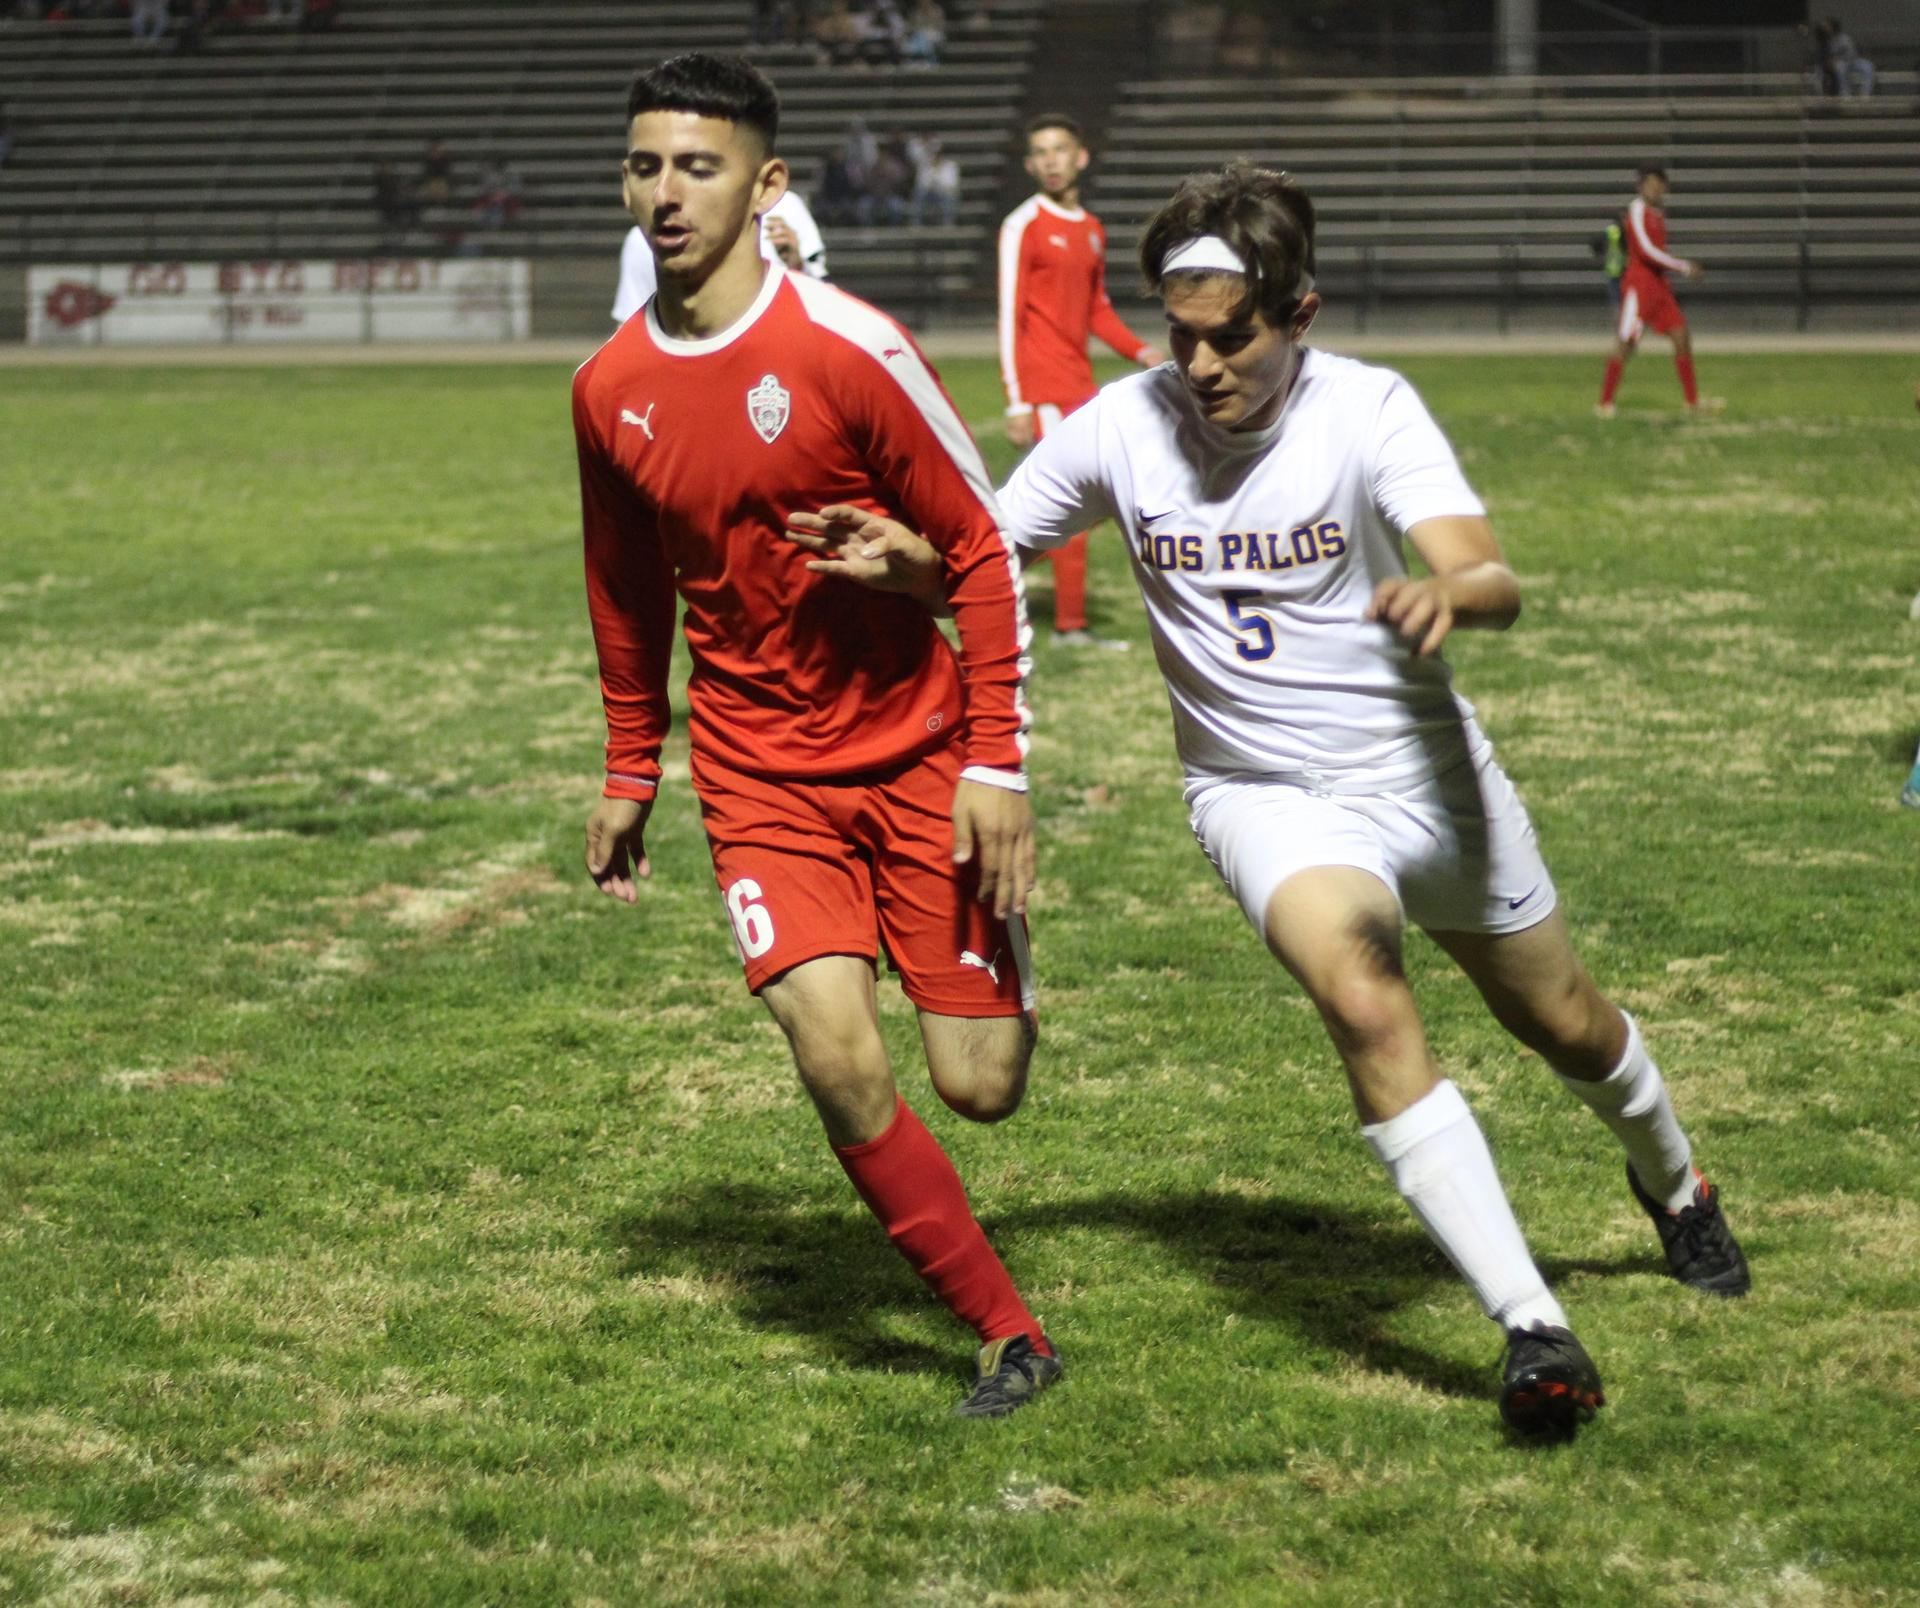 Christian Fernandez running to ball